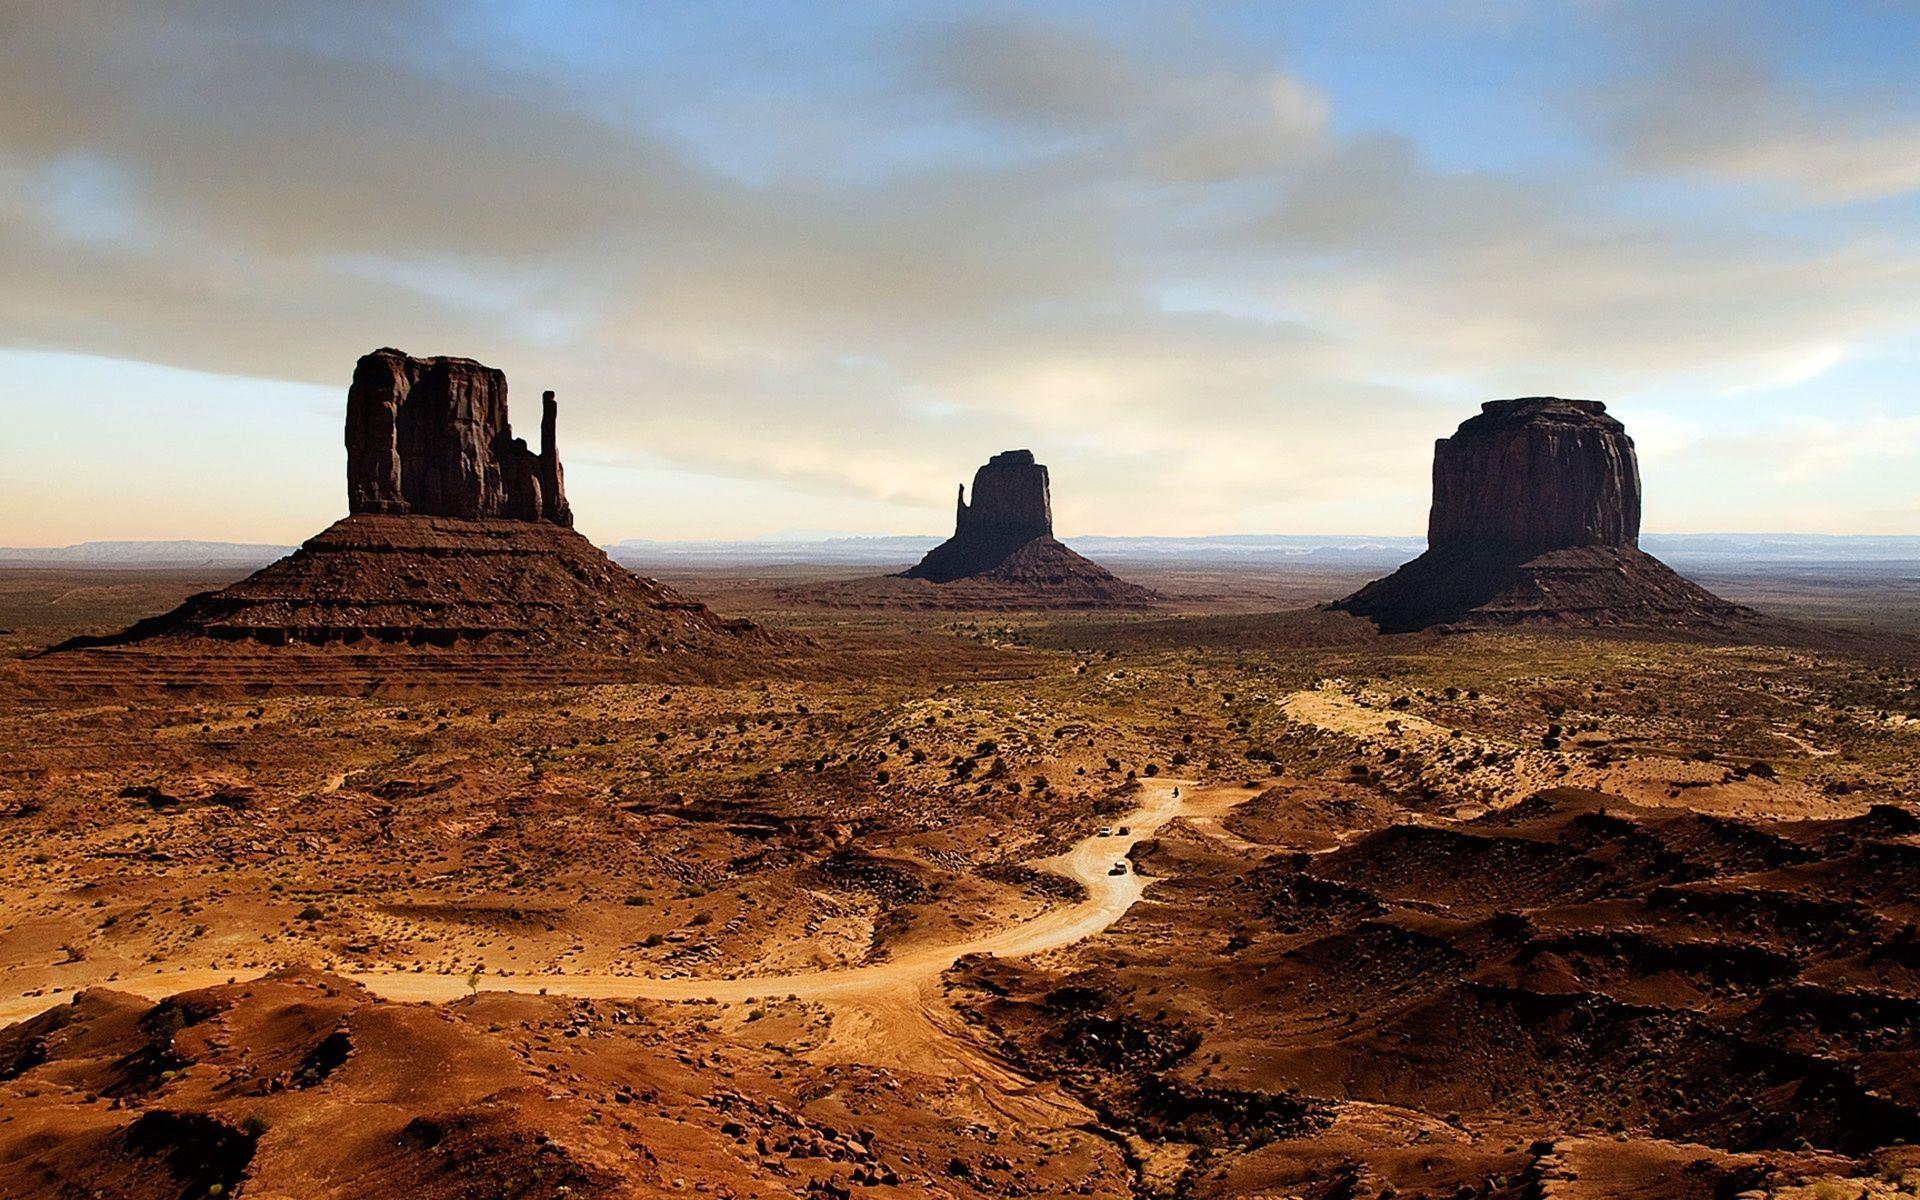 arizona desert wallpaper hd (40+ images)